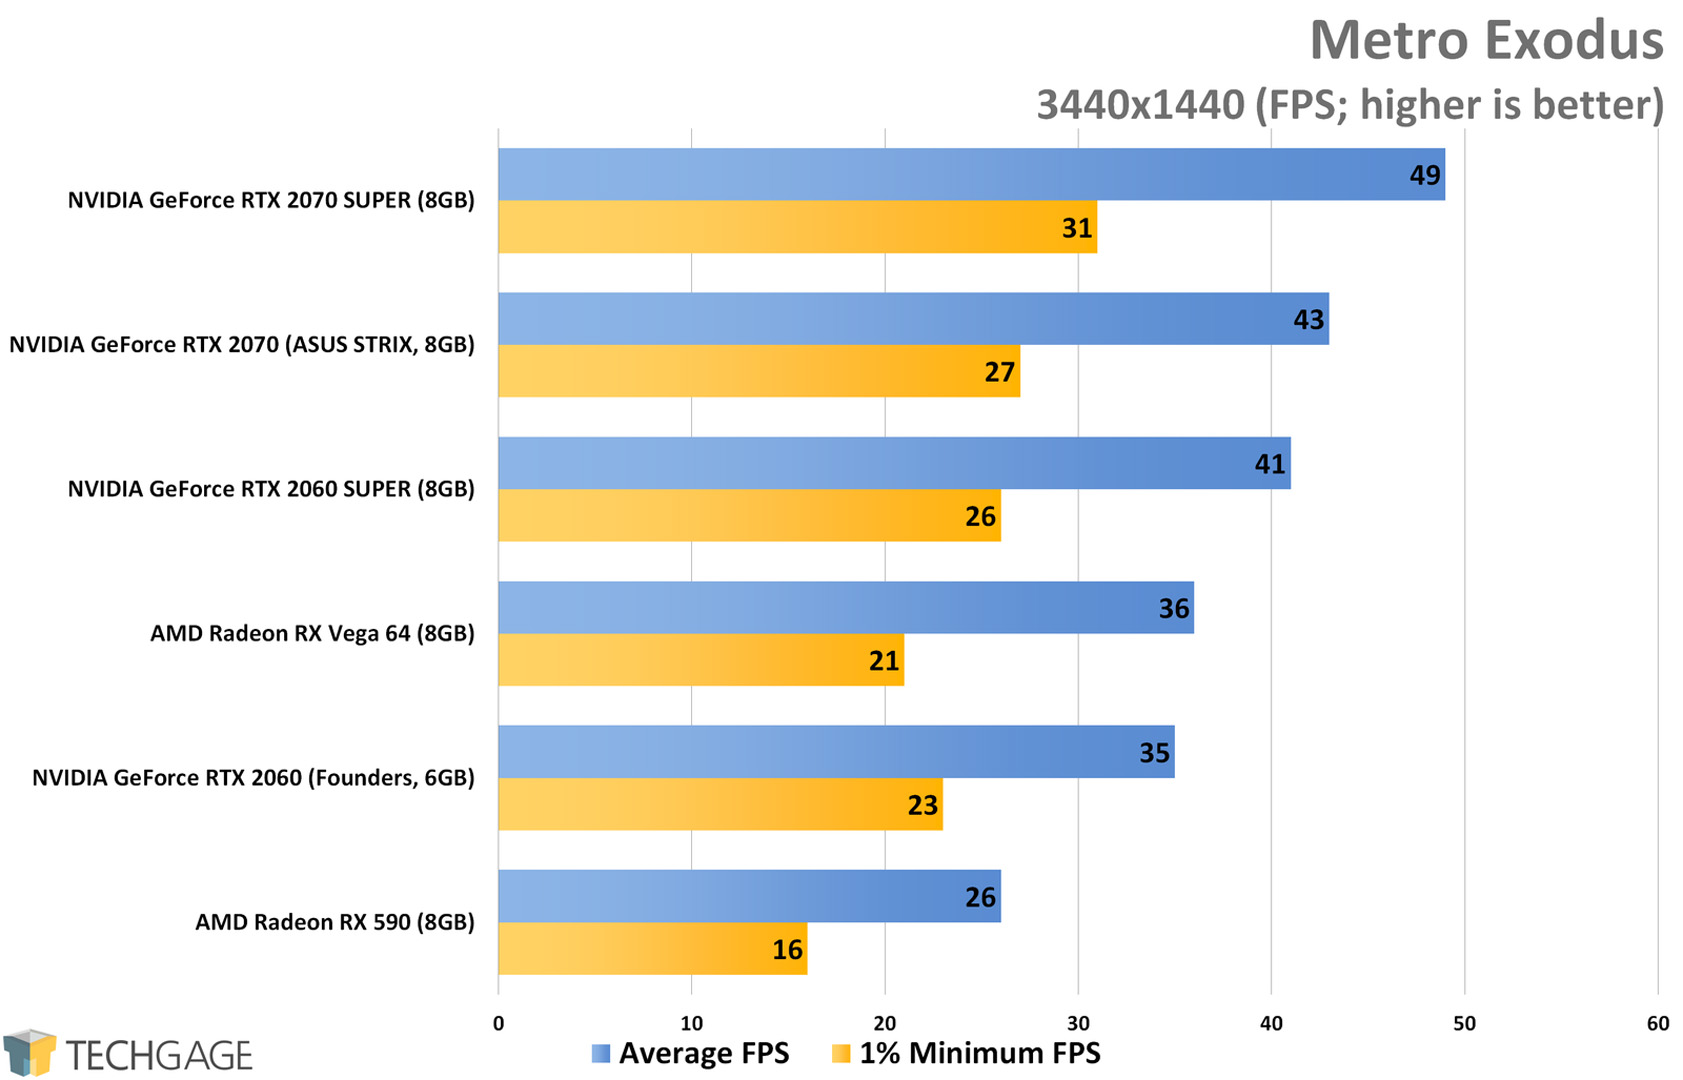 Metro Exodus (3440x1440 Ultrawide) - NVIDIA RTX SUPER 2060 and 2070 Performance